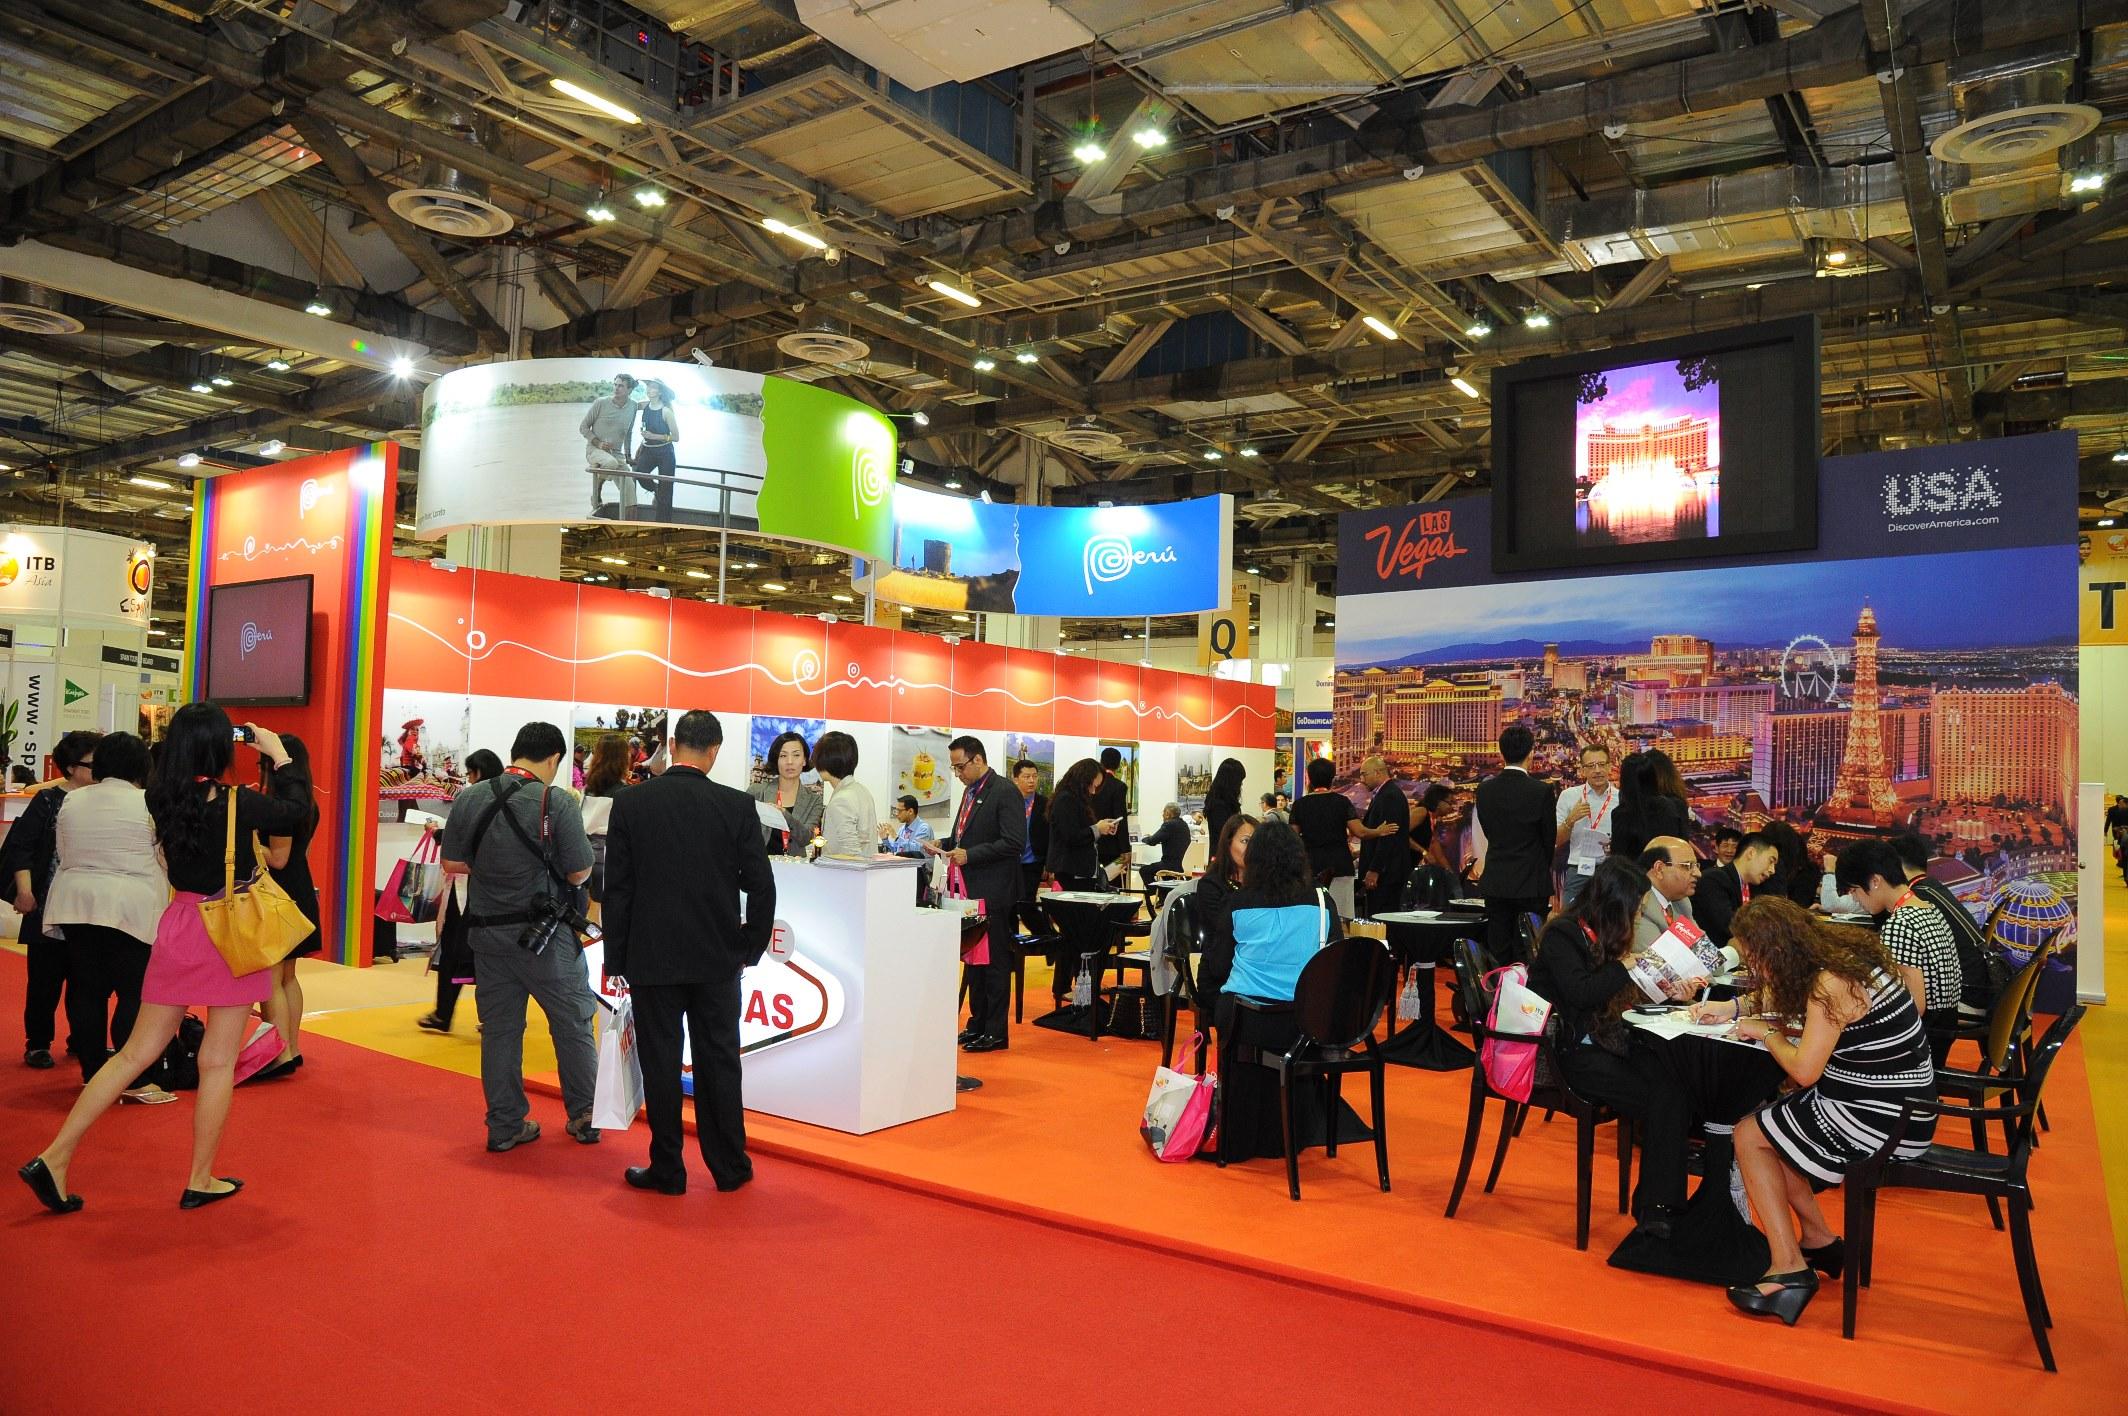 Itb Asia Exhibition Area